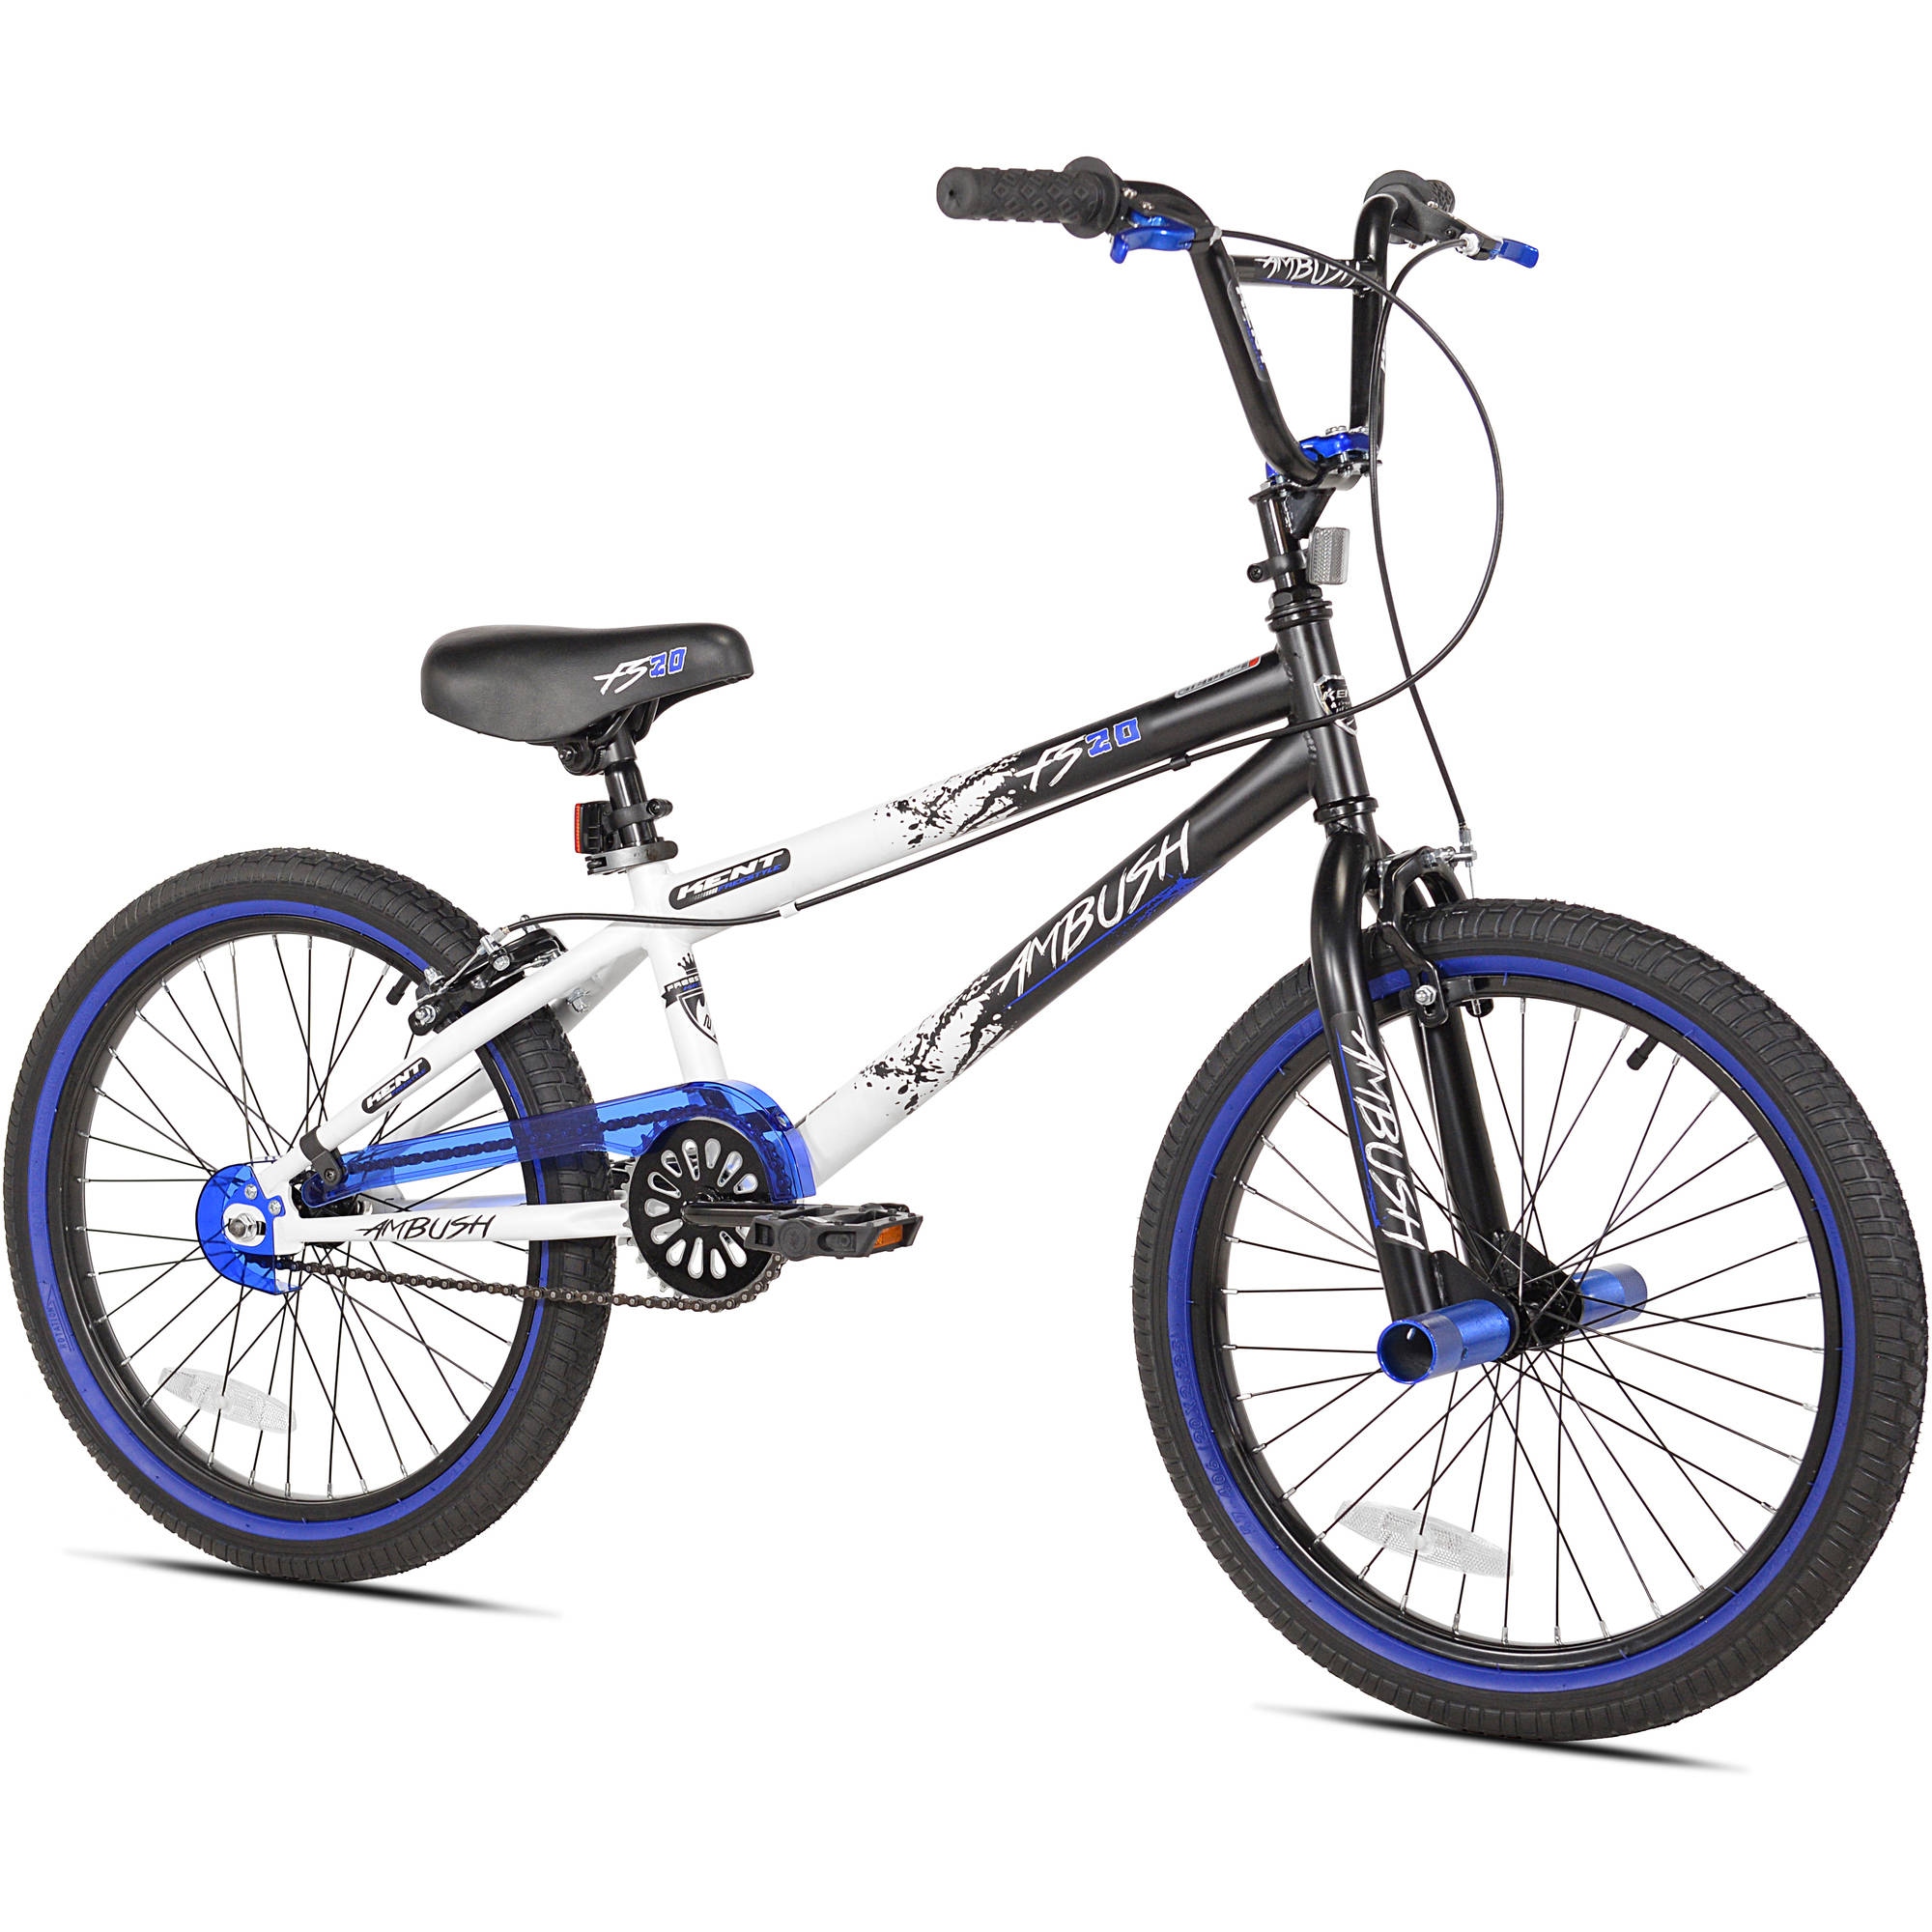 "Kent 20"" Boys', Ambush BMX Bike, Blue, For Height Sizes 4'2"" and Up by Kent International Inc"